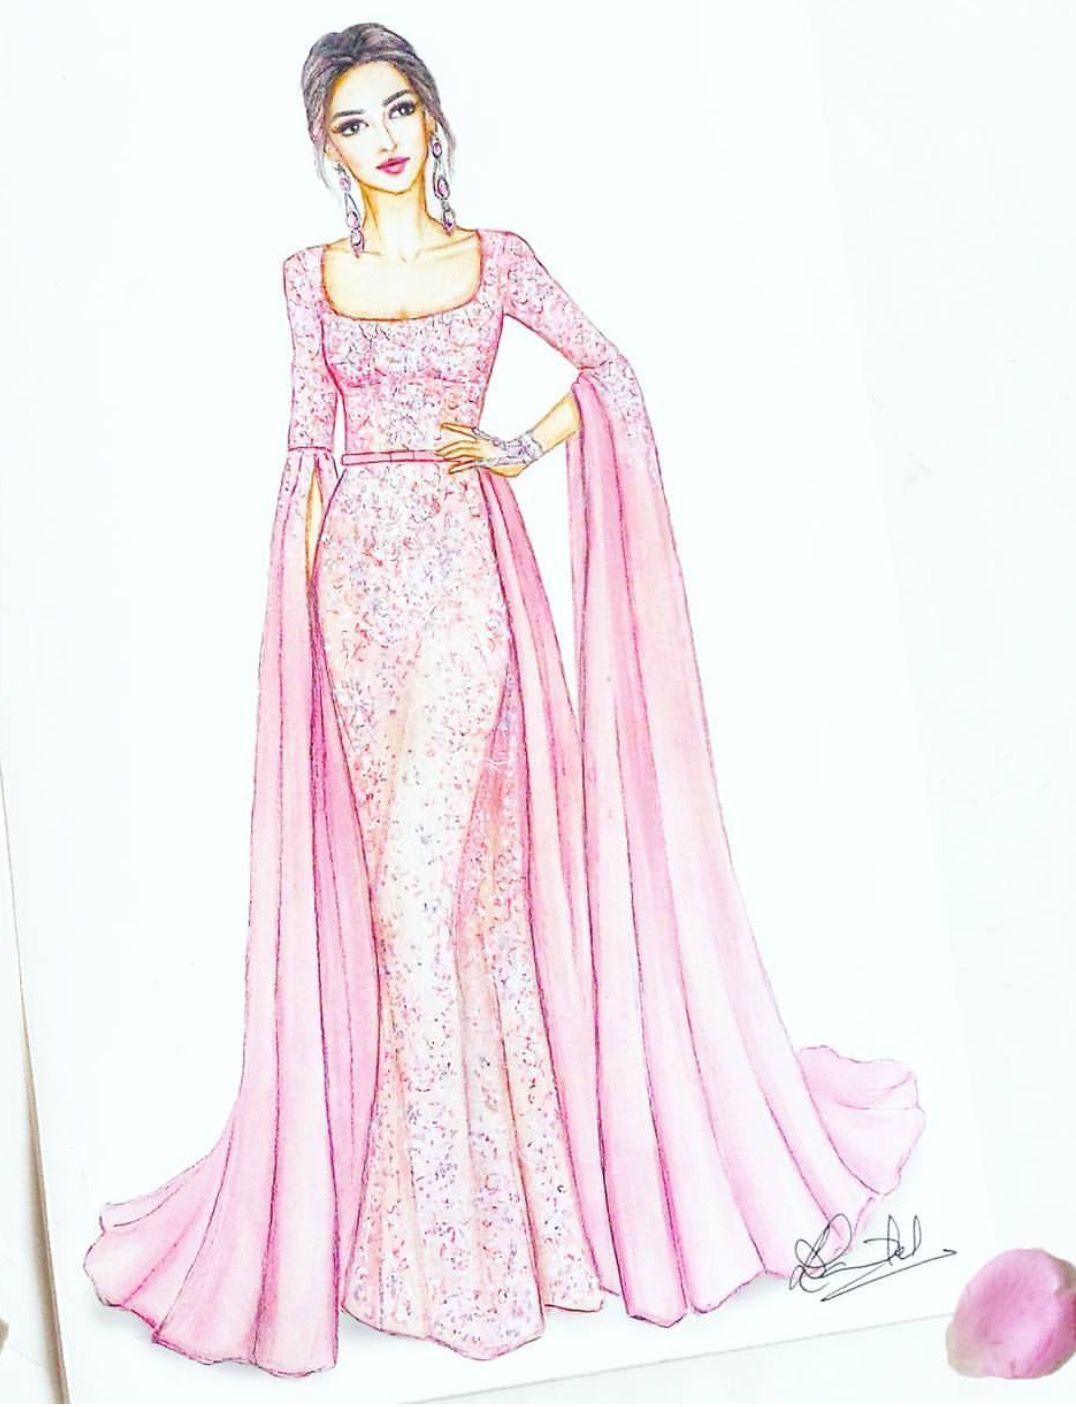 Pin de Archana en Fashion illustration   Pinterest   Bocetos ...